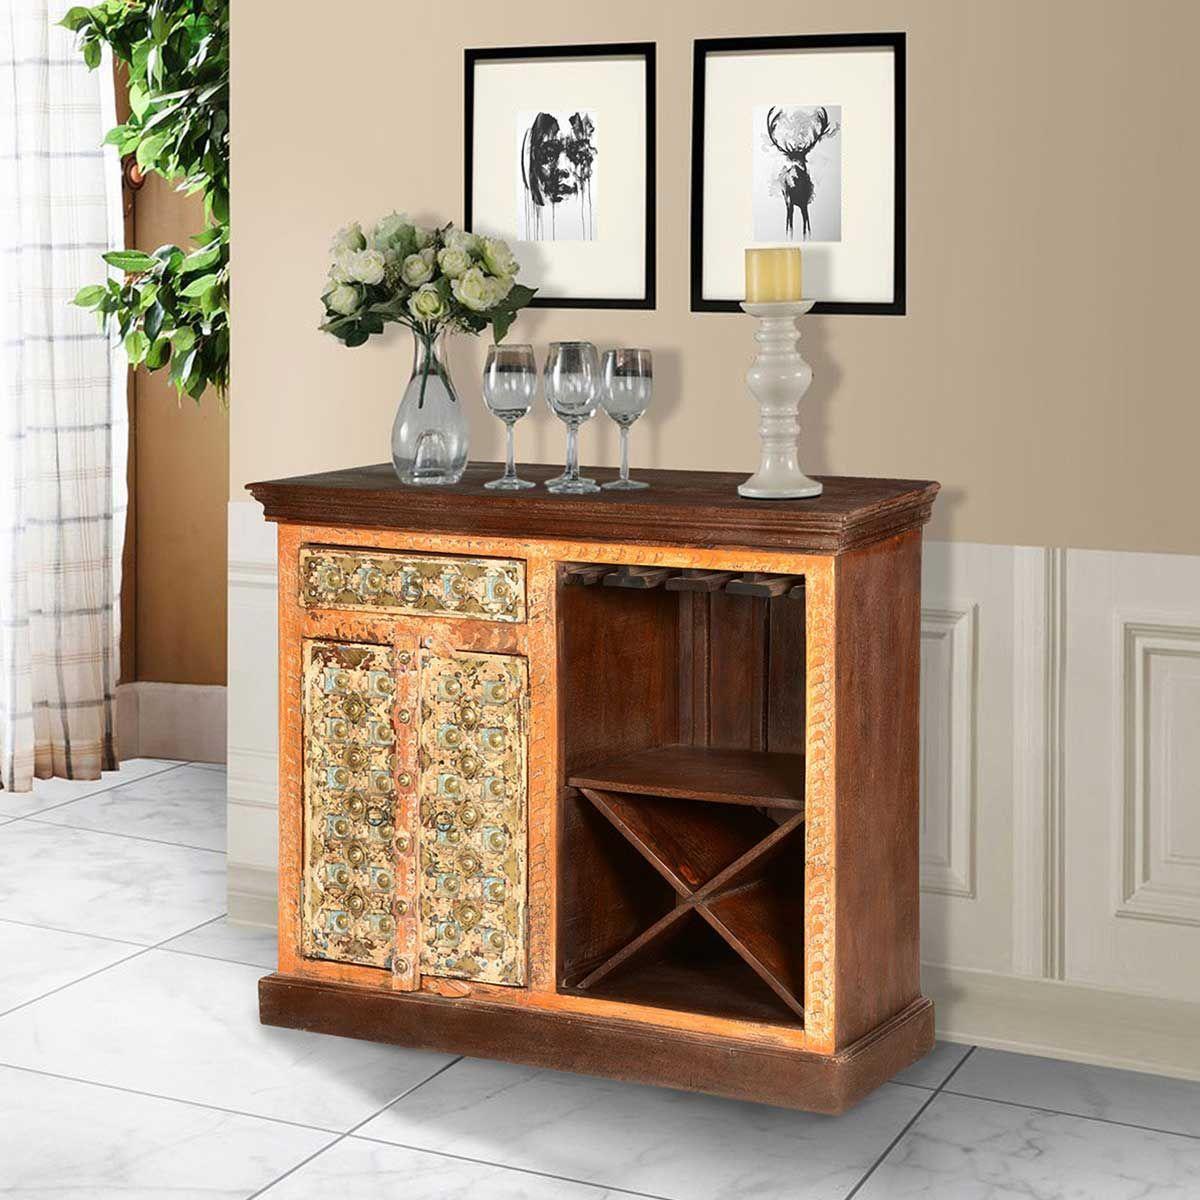 Sierra Living Concepts Golden Gothic Mango Wood Wine Rack Bar Cabinet Shop Home Decor Art Home Gorgeous Furniture Beautiful Furniture Pieces Wood Wine Racks